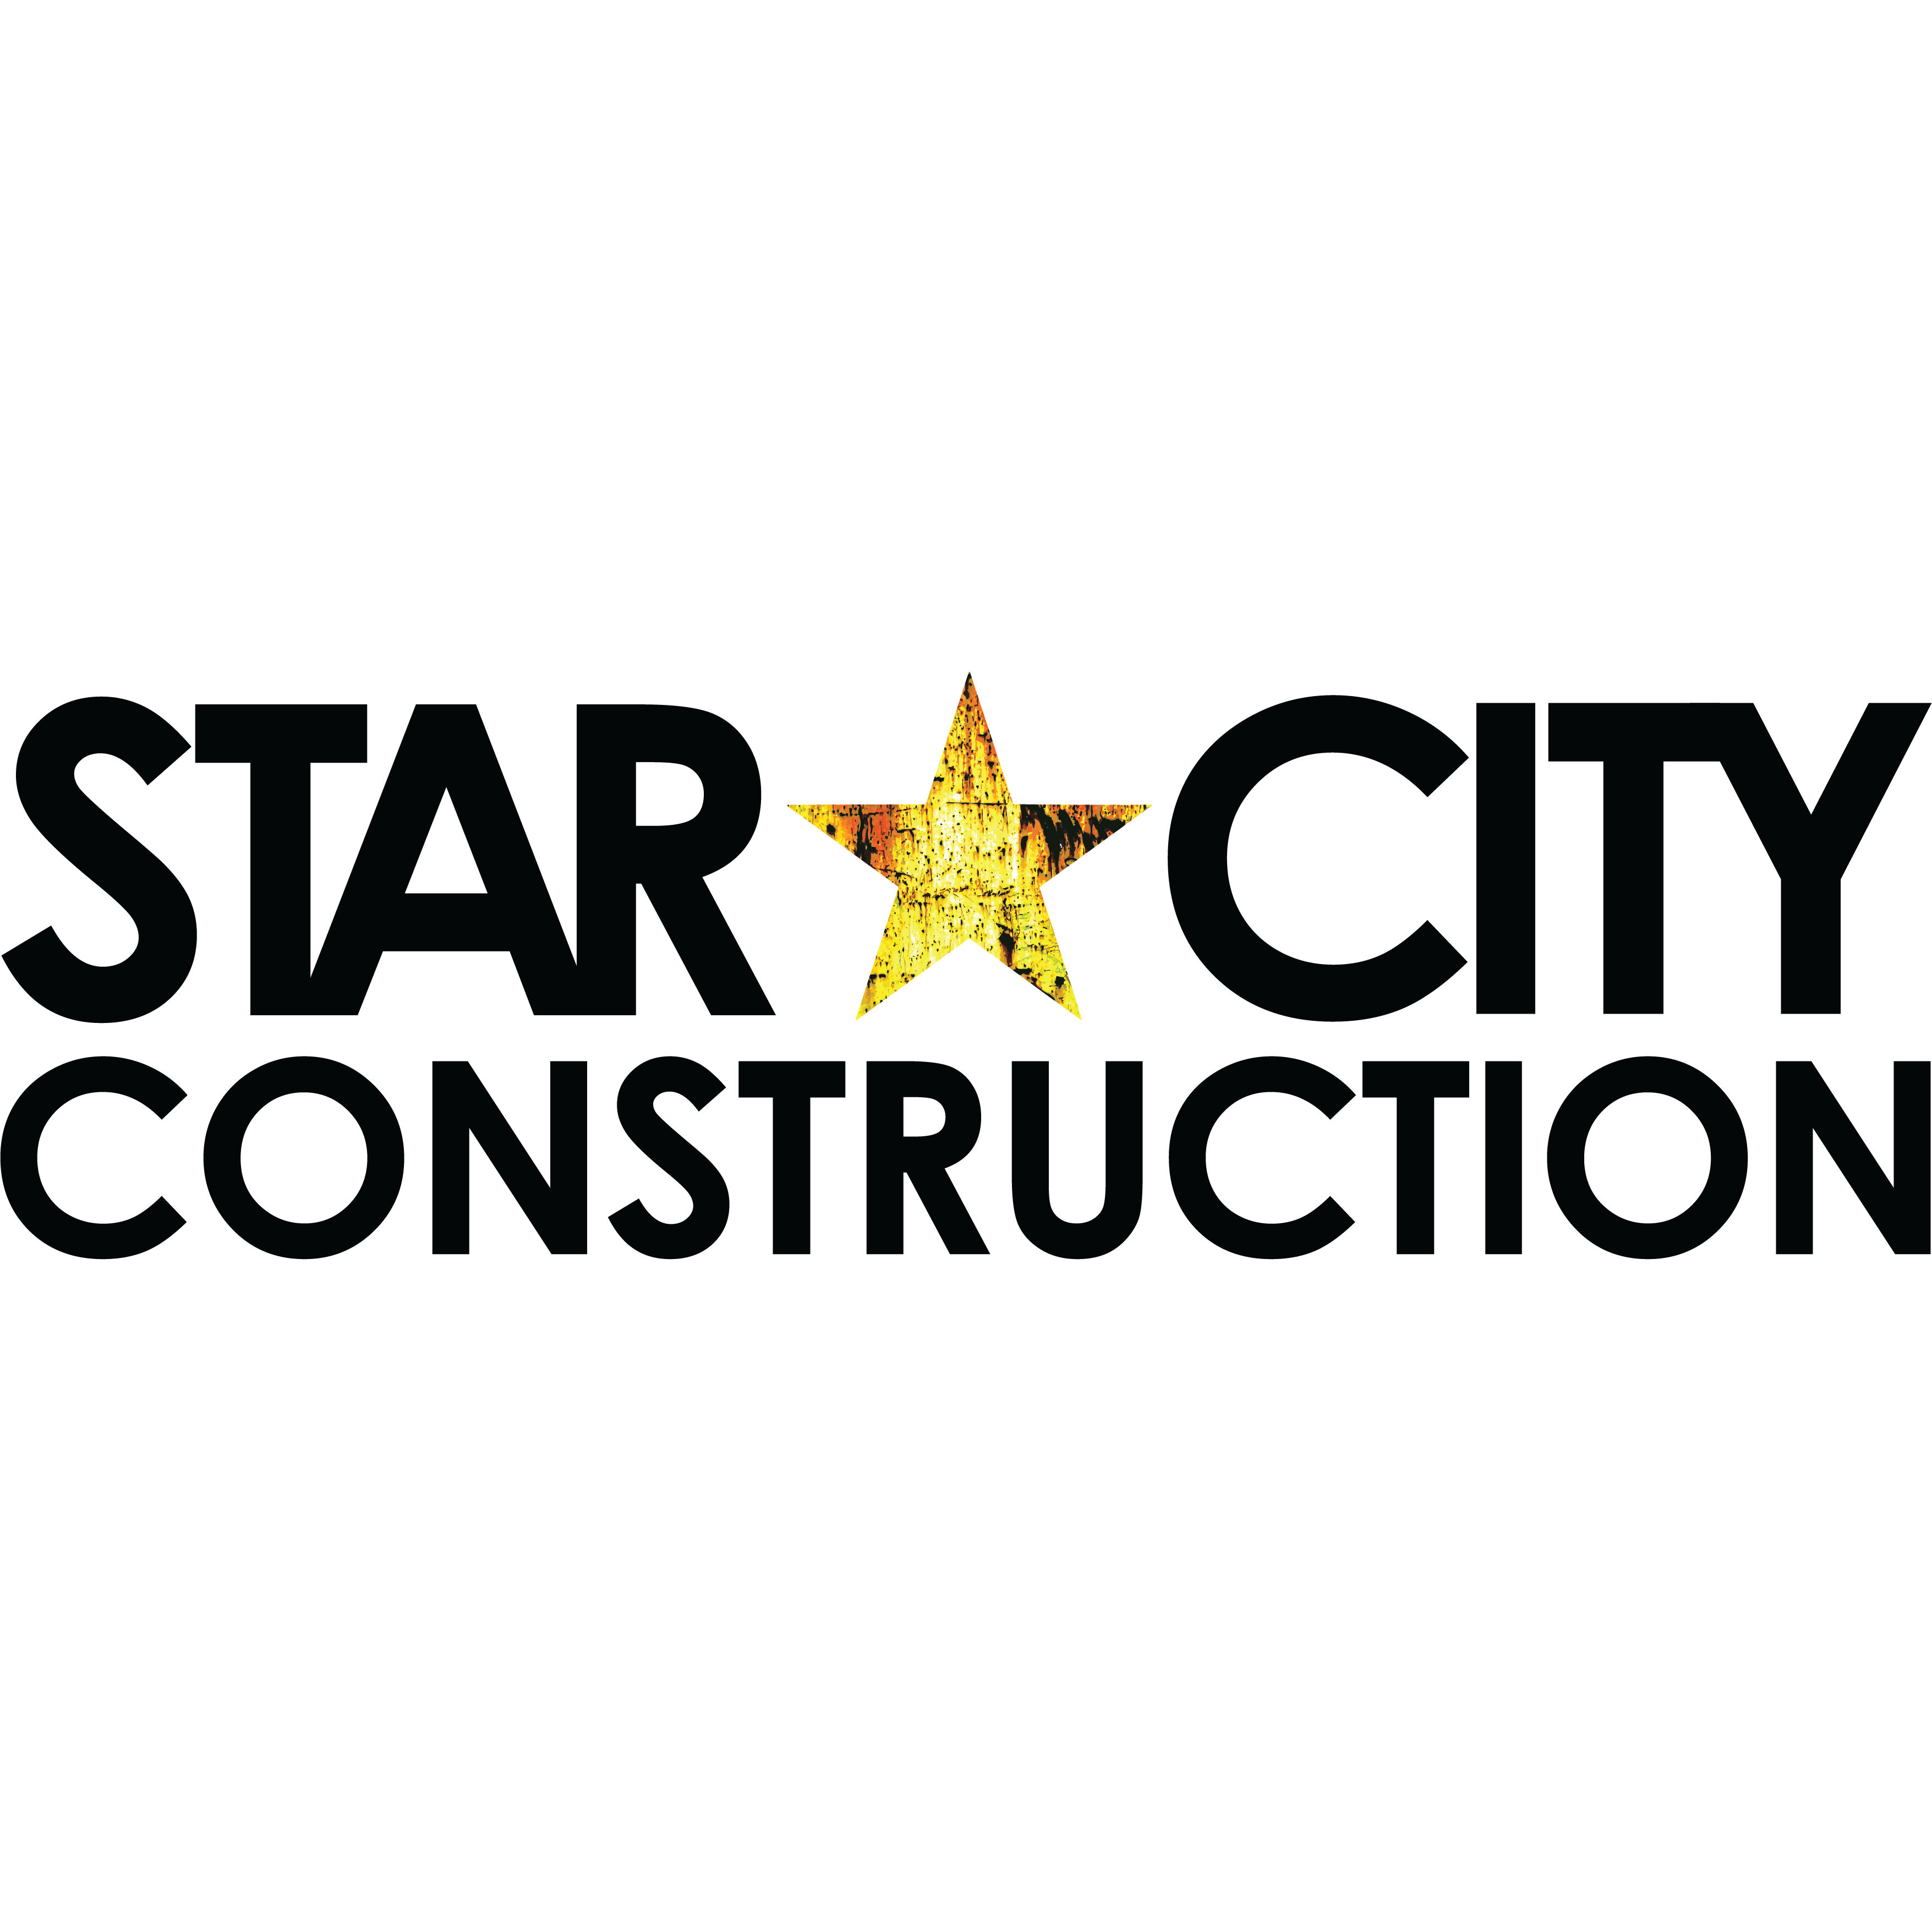 Star City Construction